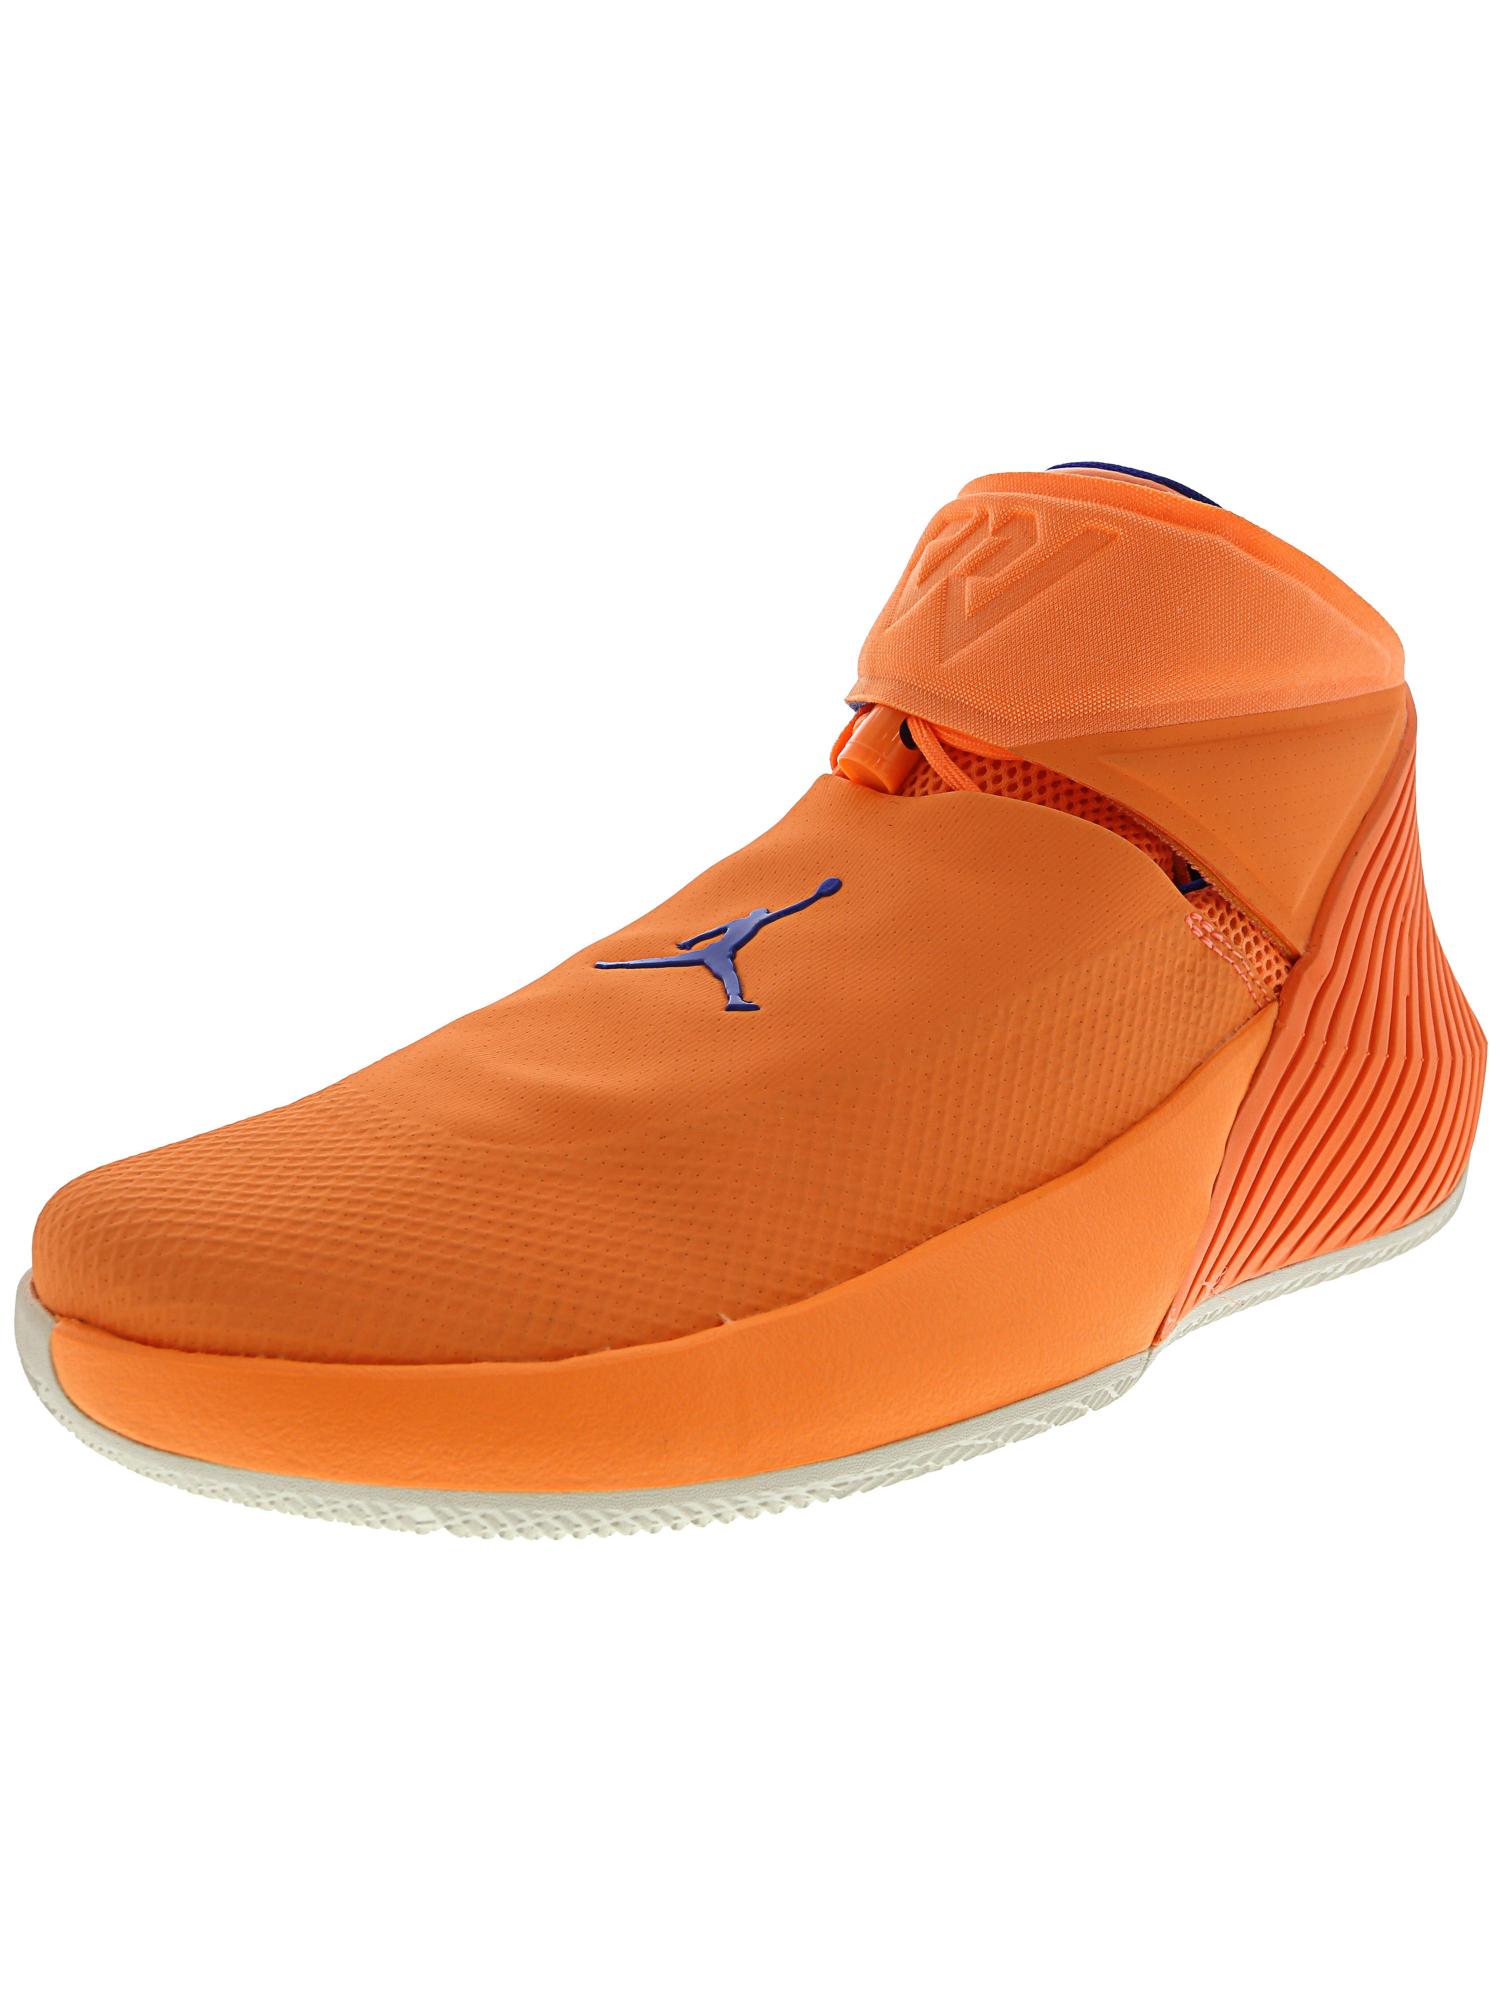 Aa2510 800 Air Jordan Why Not Zer0.1 Russell Westbrook Cotton Shot ... 532629bbc6